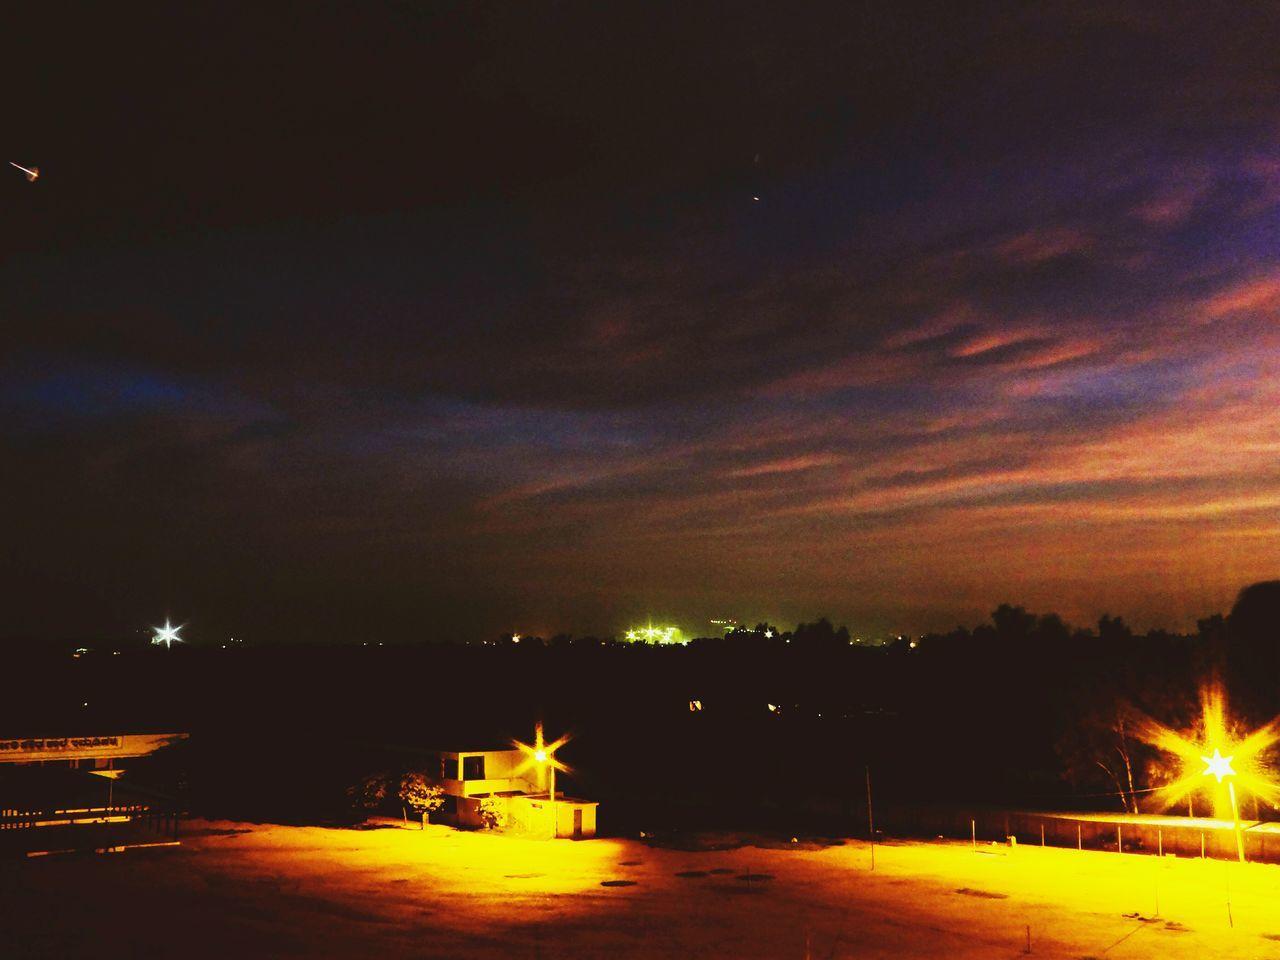 Lit lamps along road at night